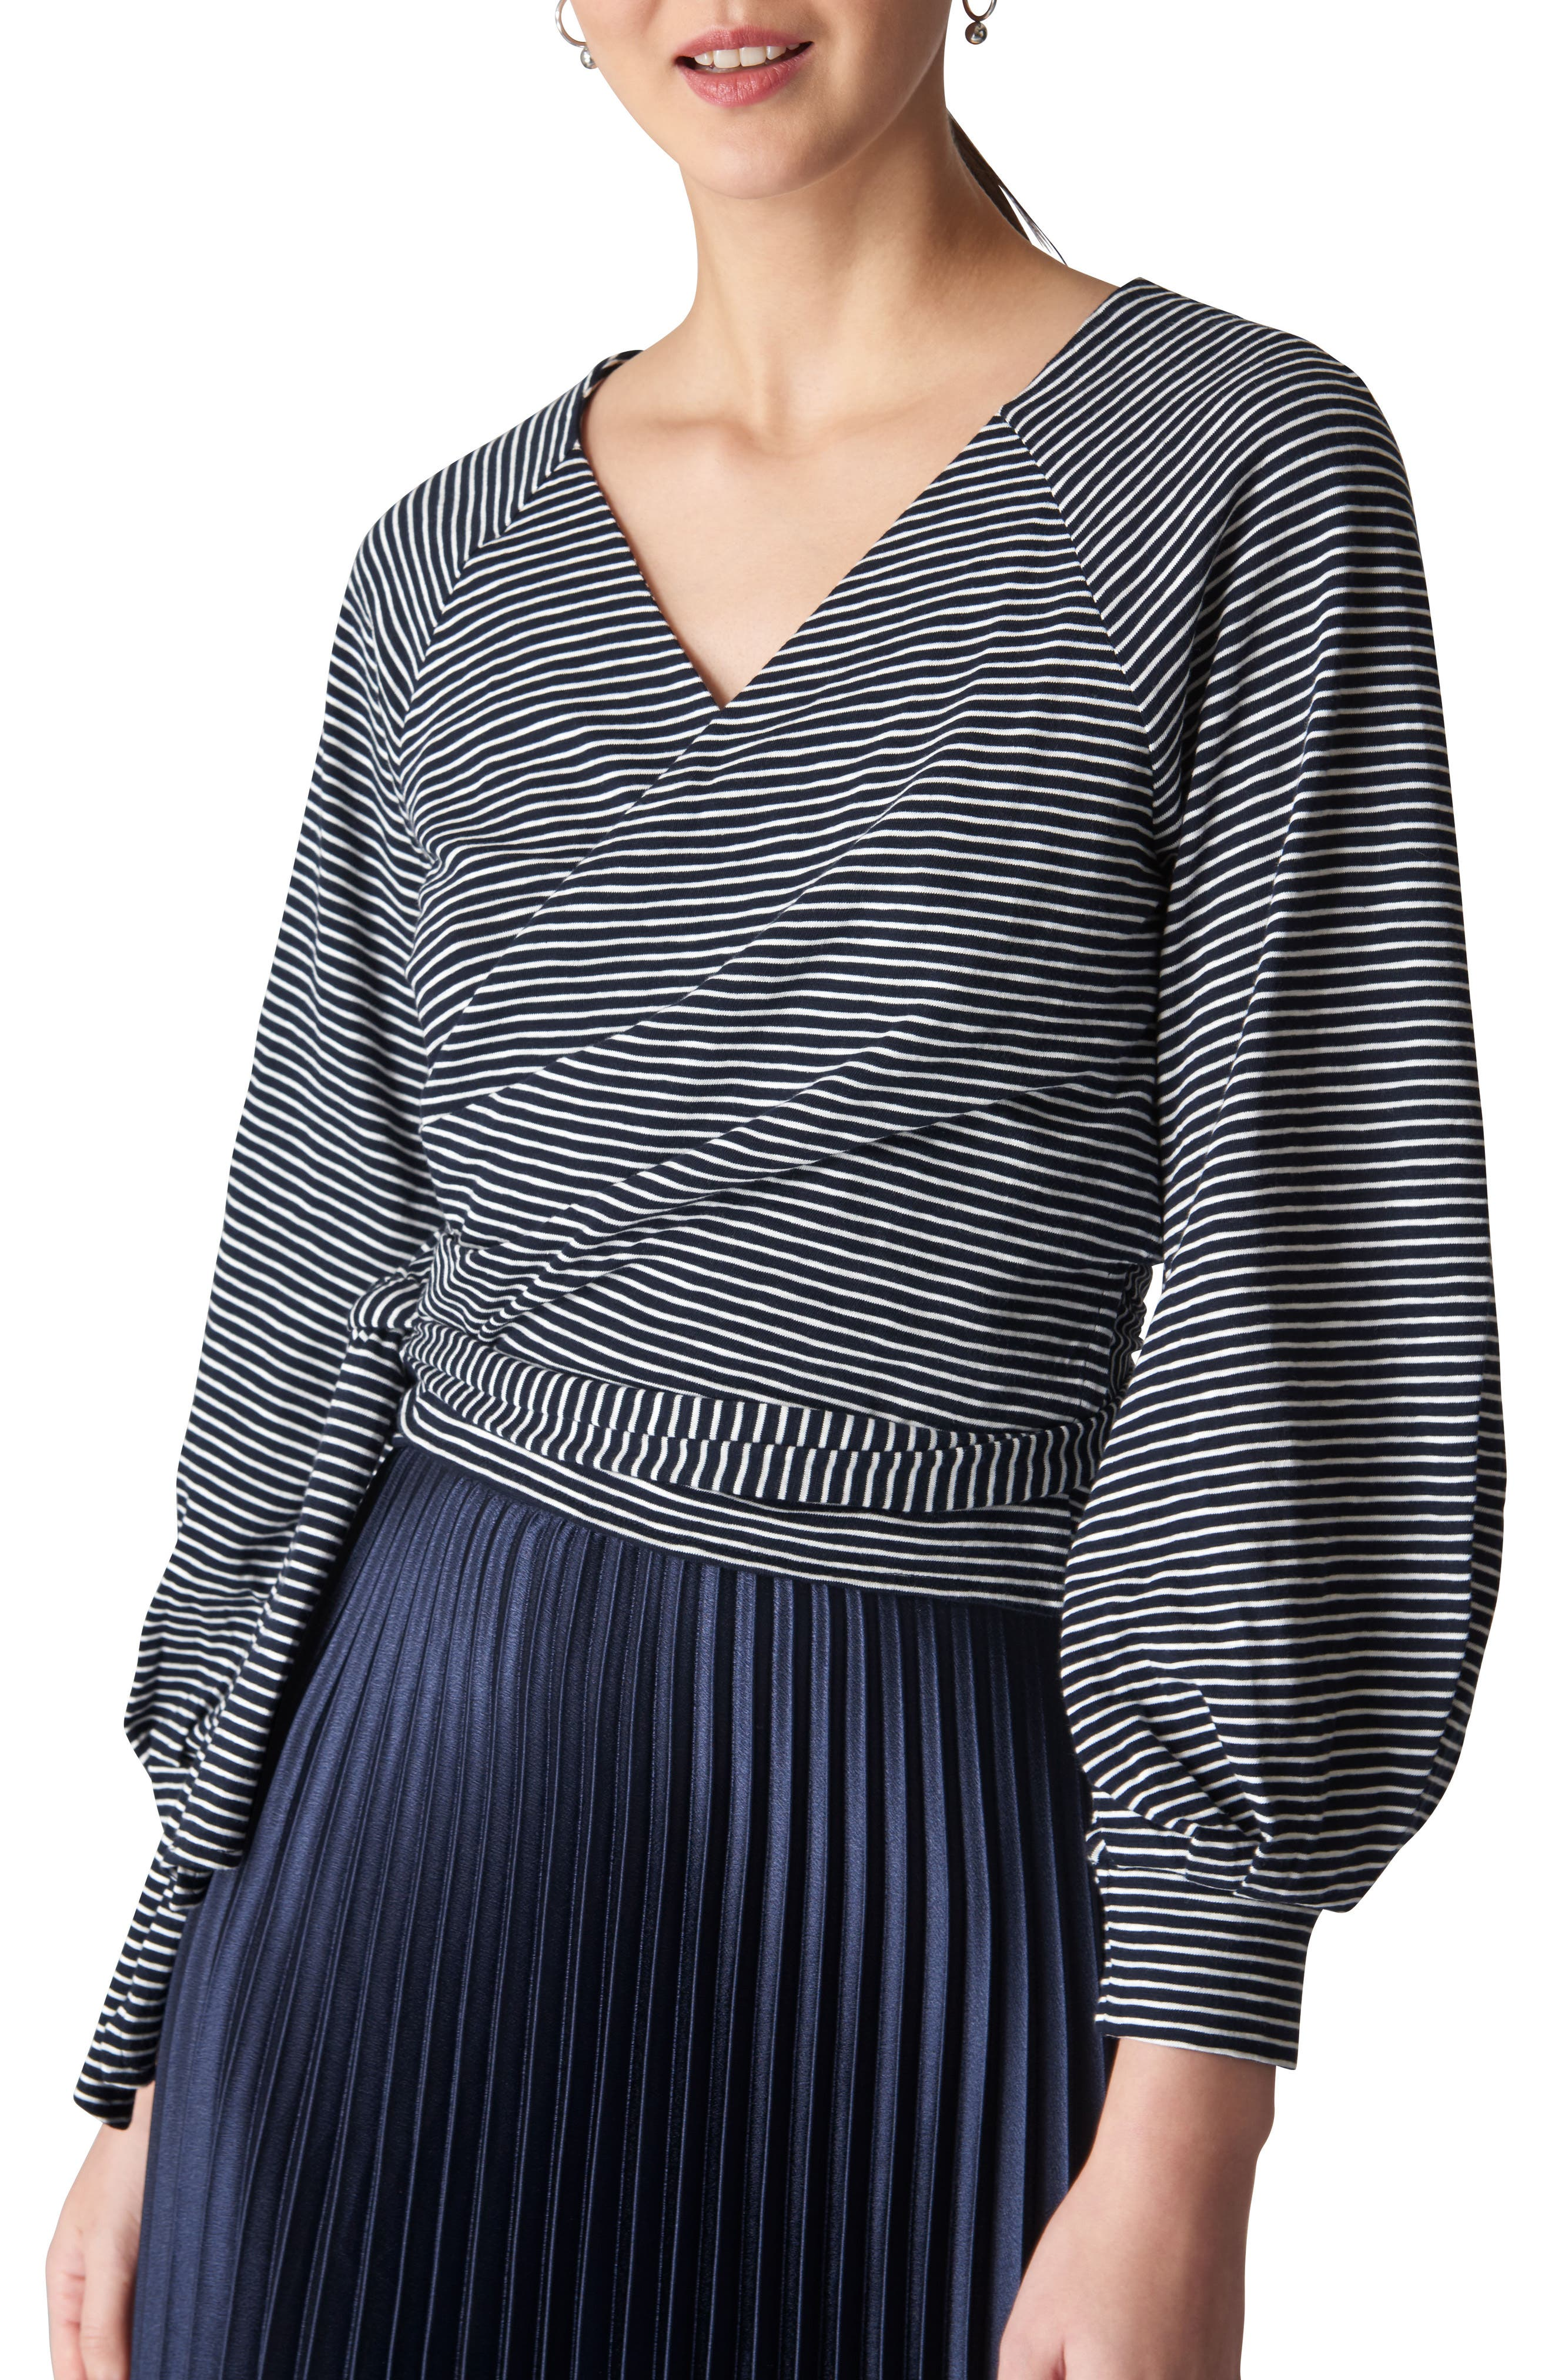 Stripe Wraparound Top,                         Main,                         color, 001